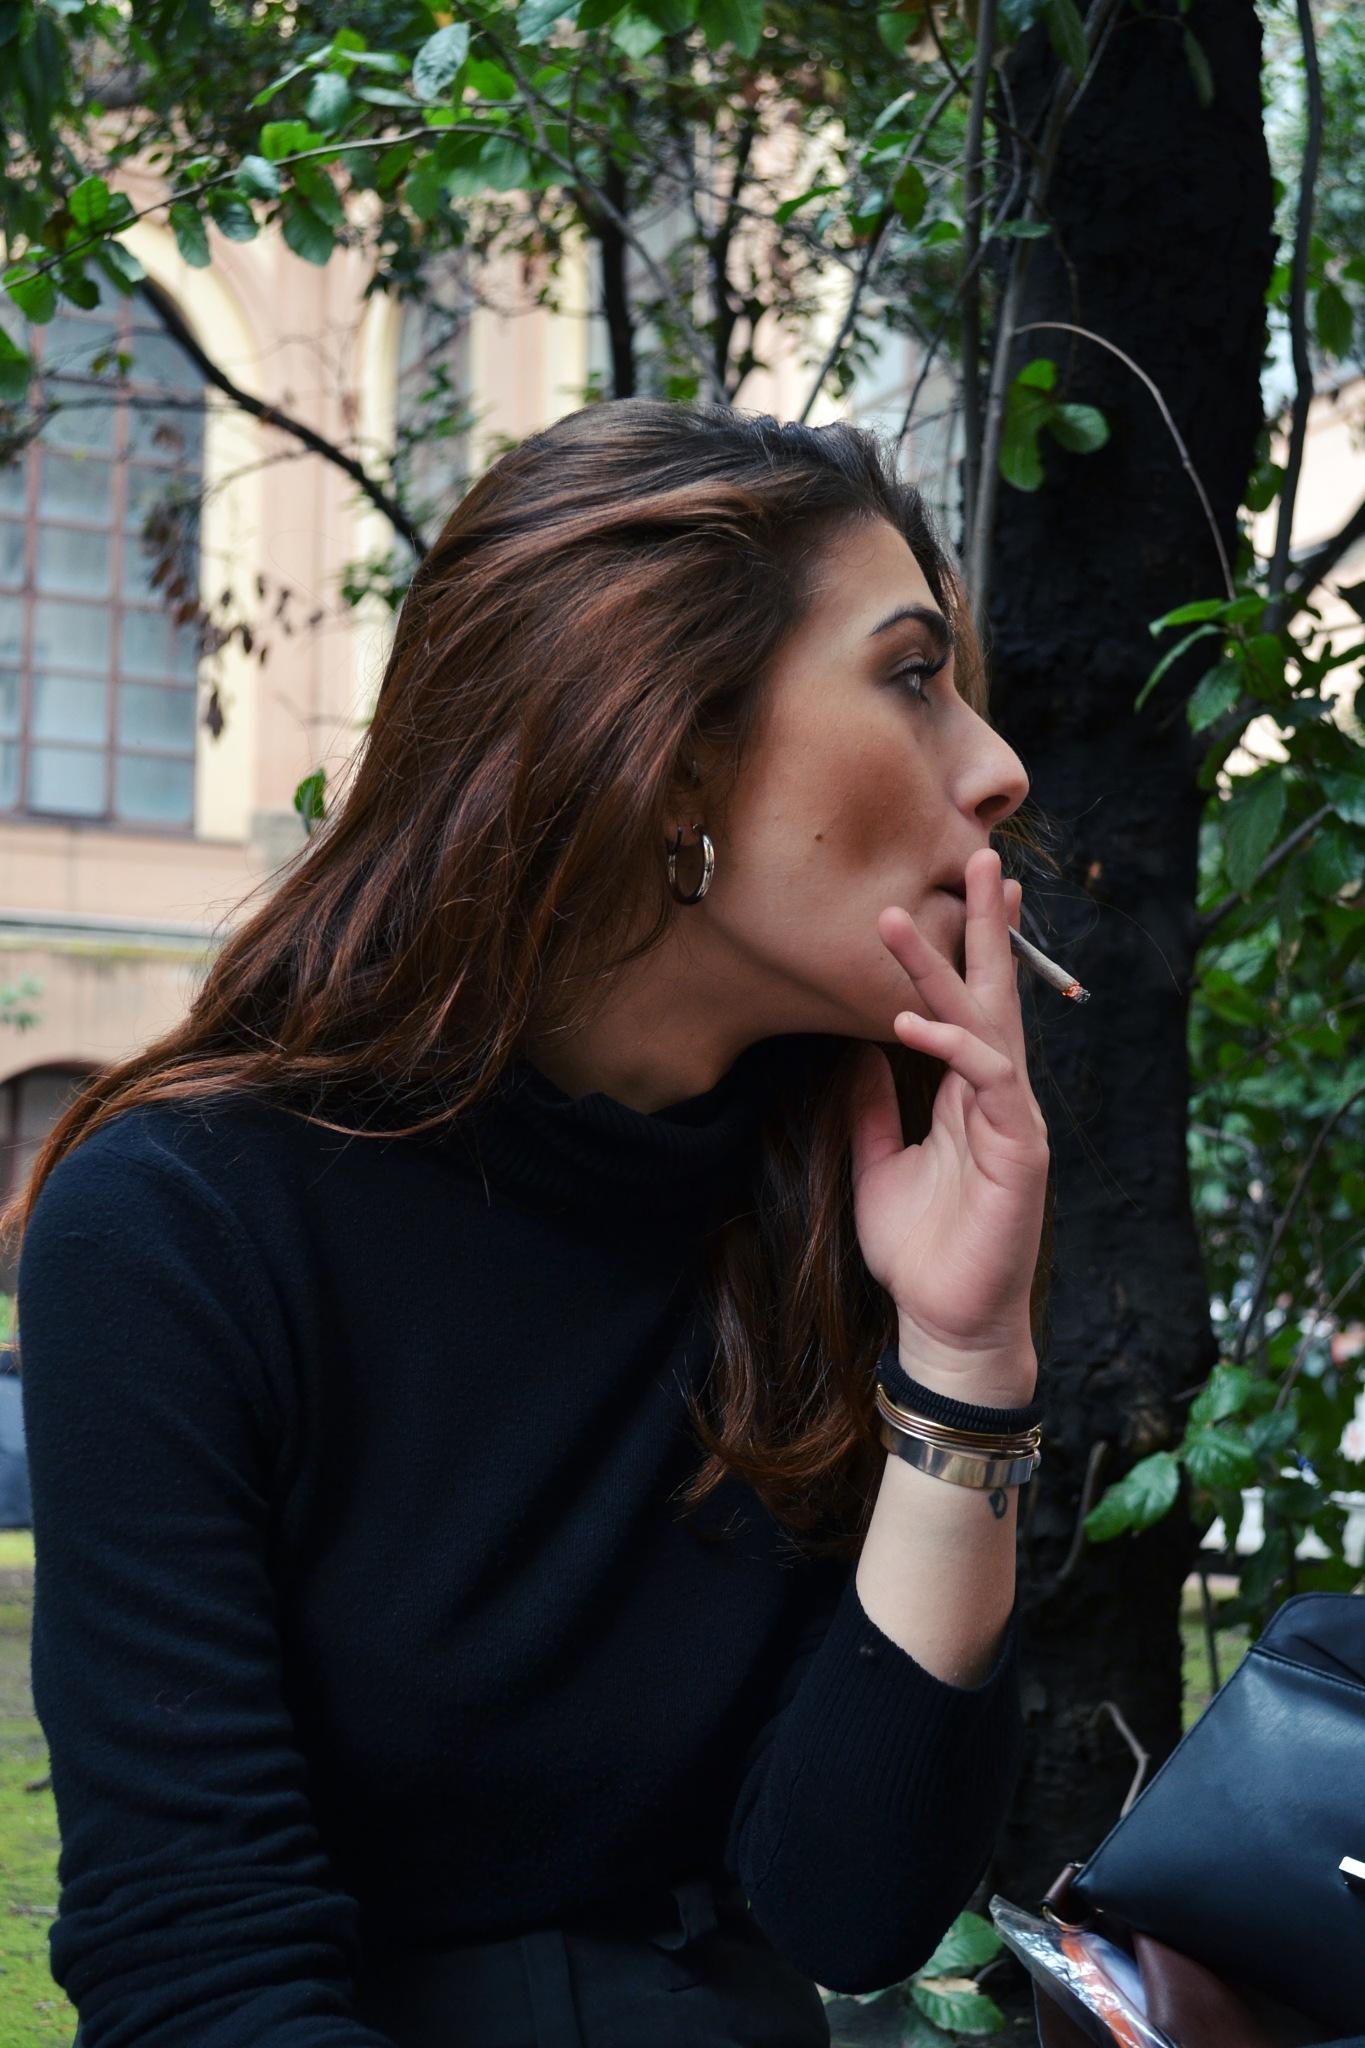 Lady by Rosalba Avventura